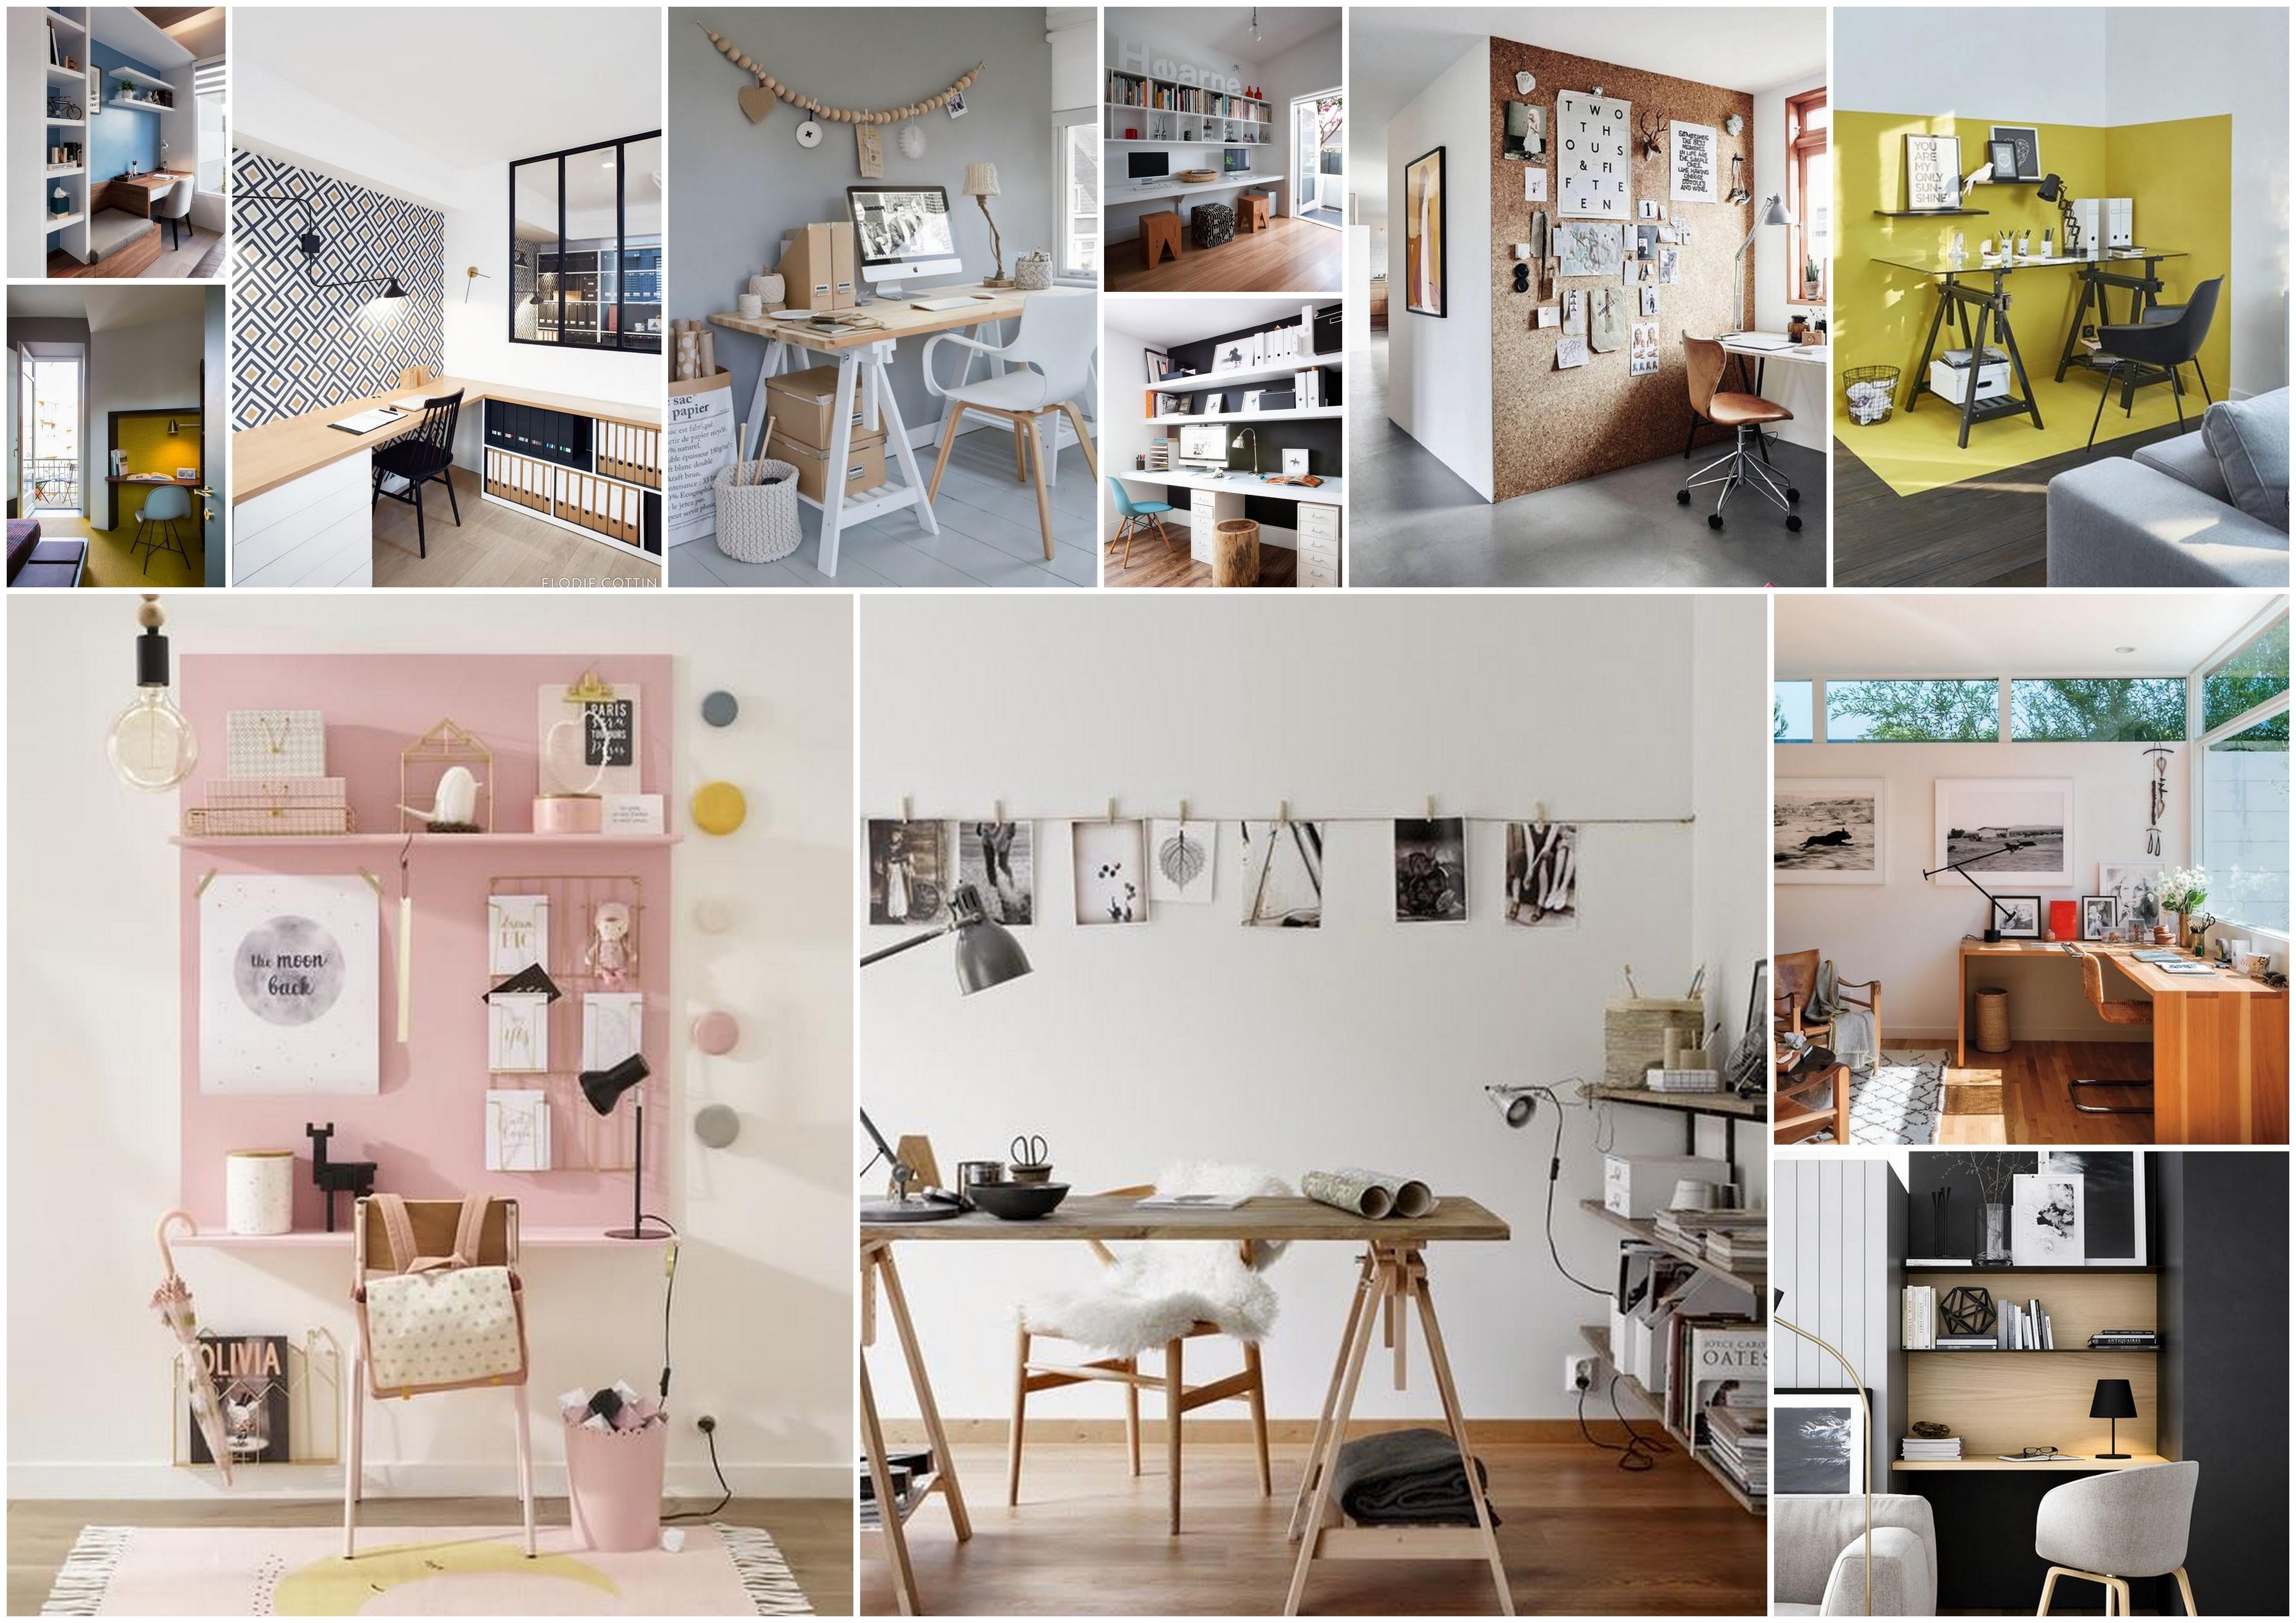 log-SOLLYS-deco-decoratrice-dintérieur-gironde-33-Bureau